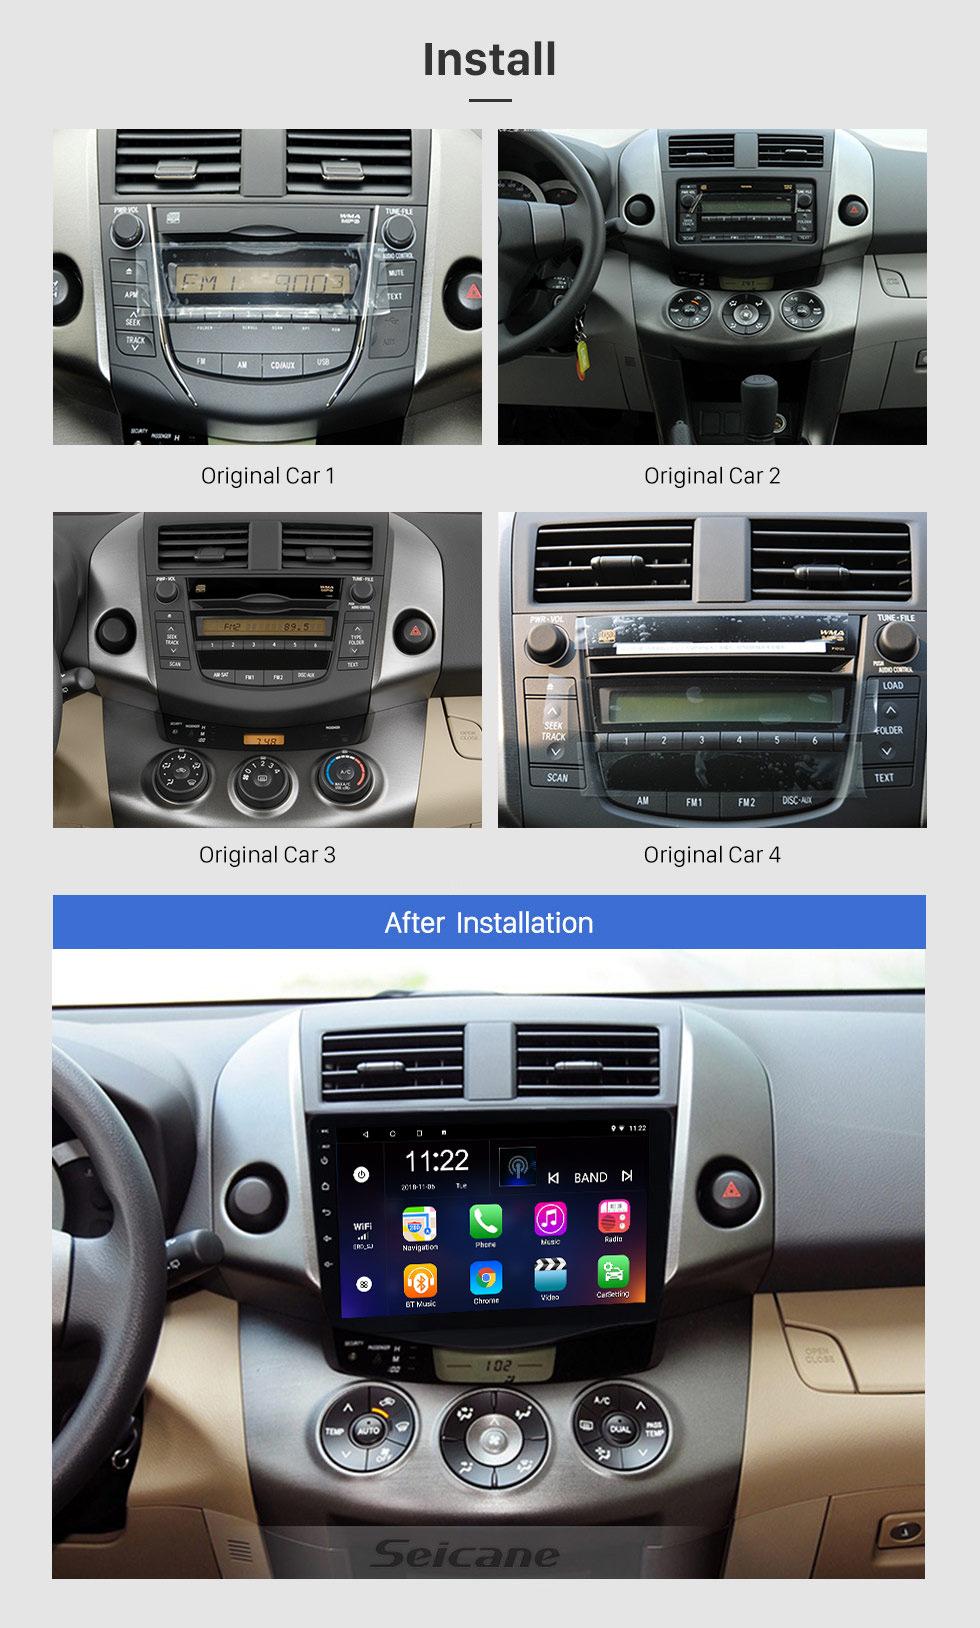 Seicane 2007-2013 Toyota RAV4 Android 8.1 Radio 9 inch HD Touchscreen GPS Navigation Steering Wheel control WIFI USB Bluetooth support DVR Backup Camera TV Video